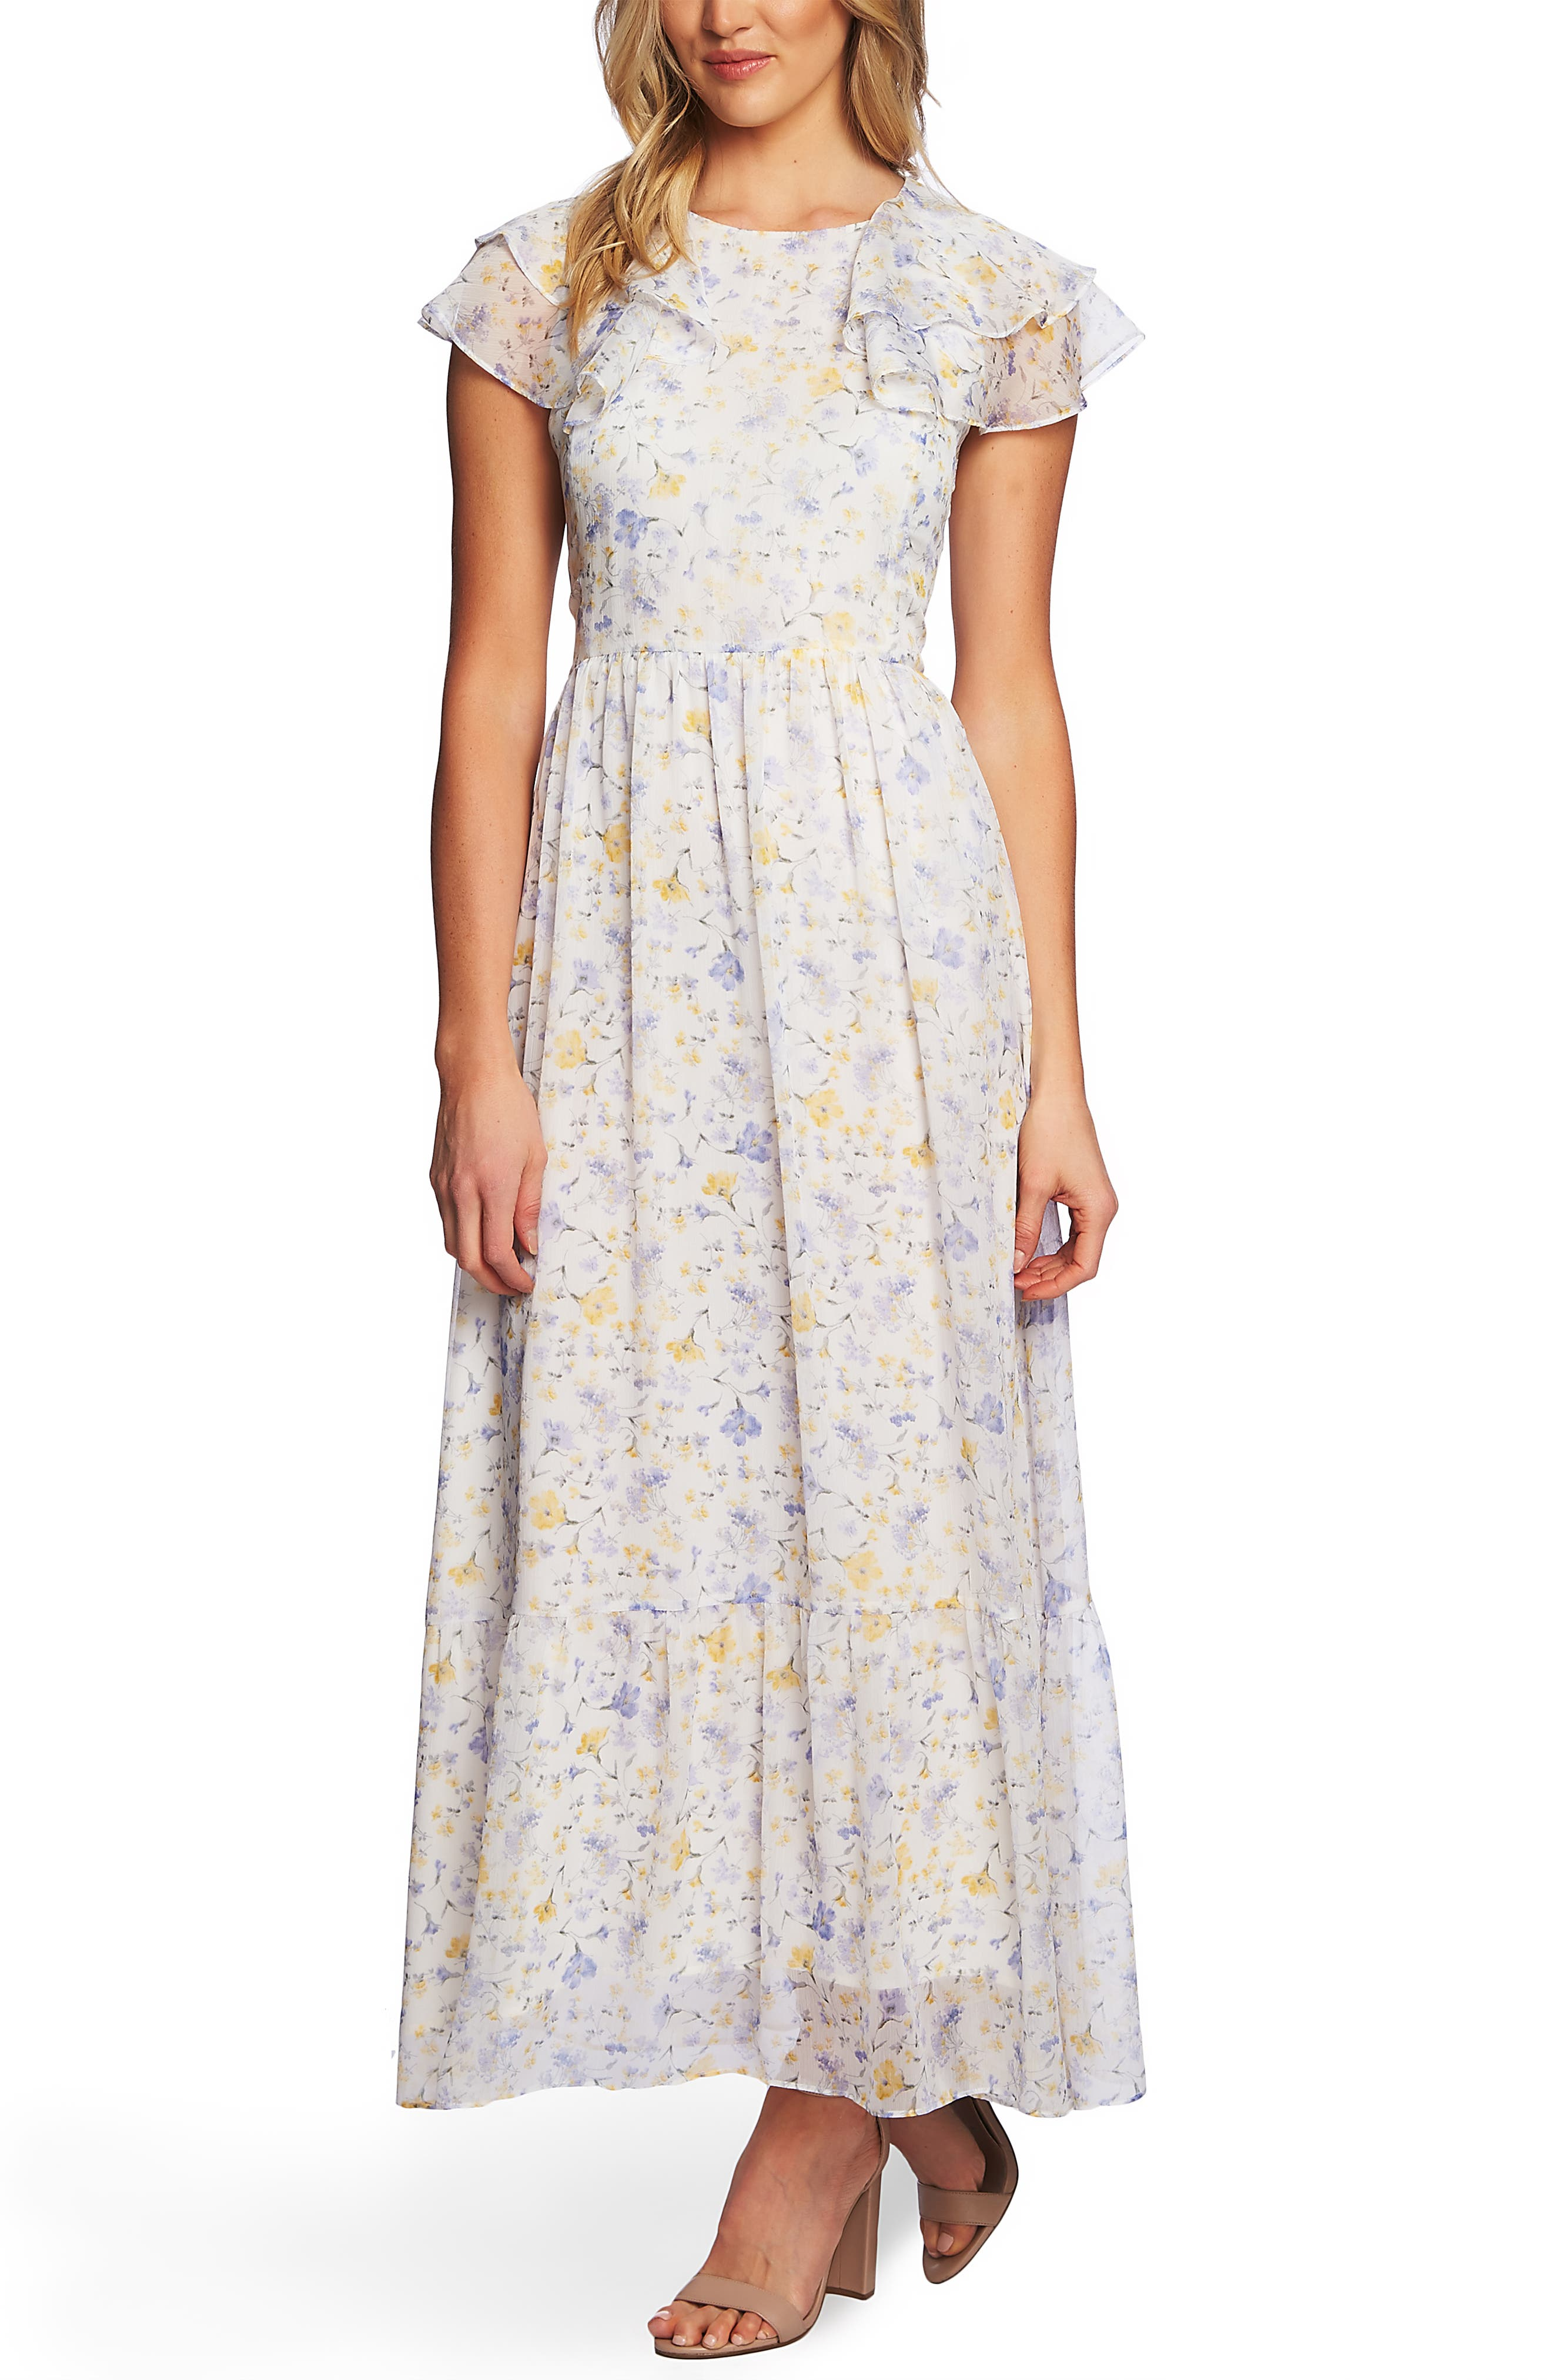 1930s Day Dresses, Tea Dresses, House Dresses Womens Cece Provence Floral Ruffle Hem Maxi Dress $149.00 AT vintagedancer.com